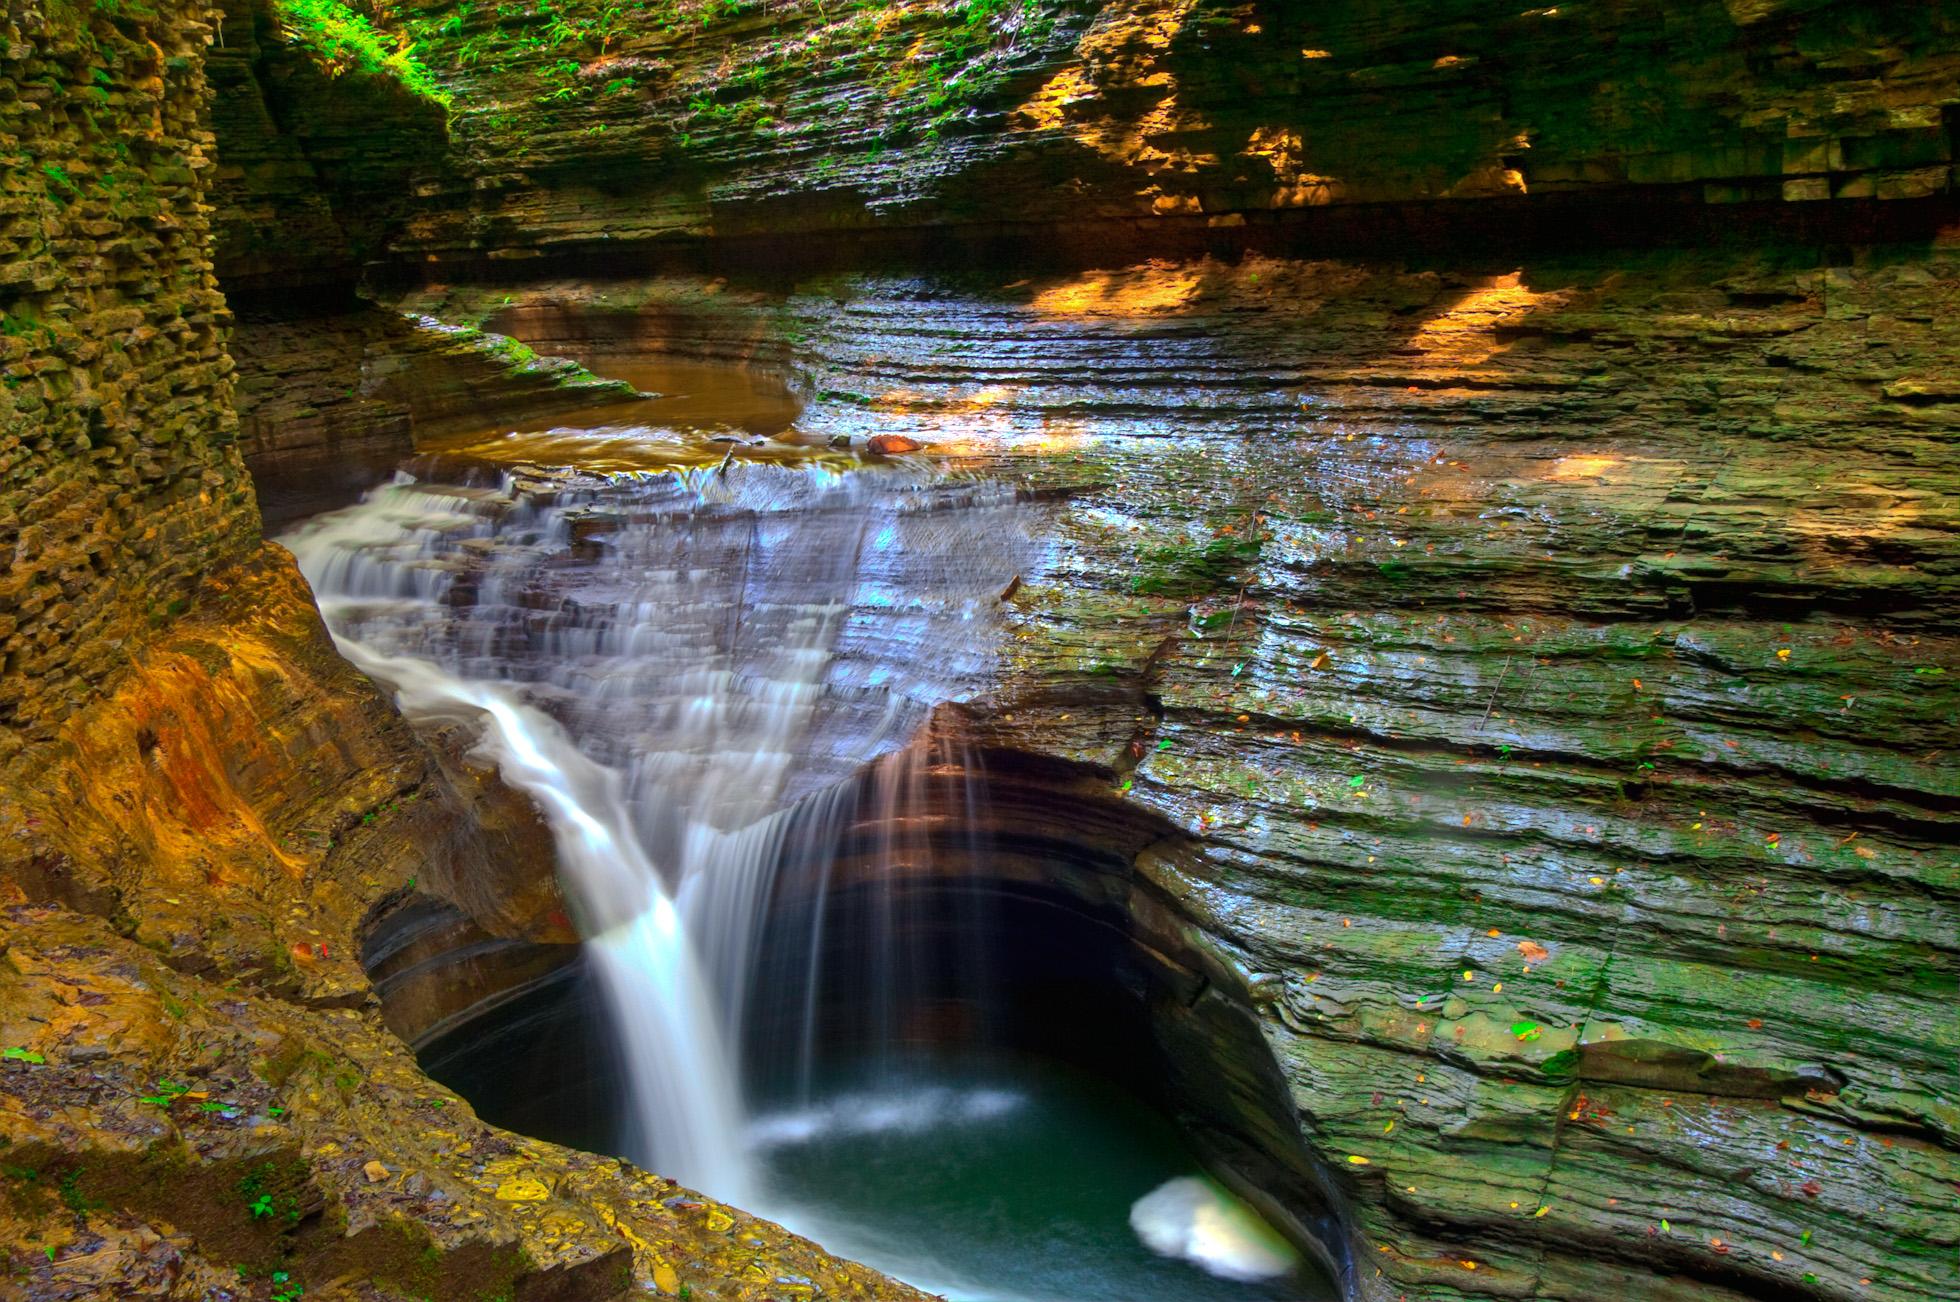 Watkin Glens State Park Hd Wallpaper Background Image